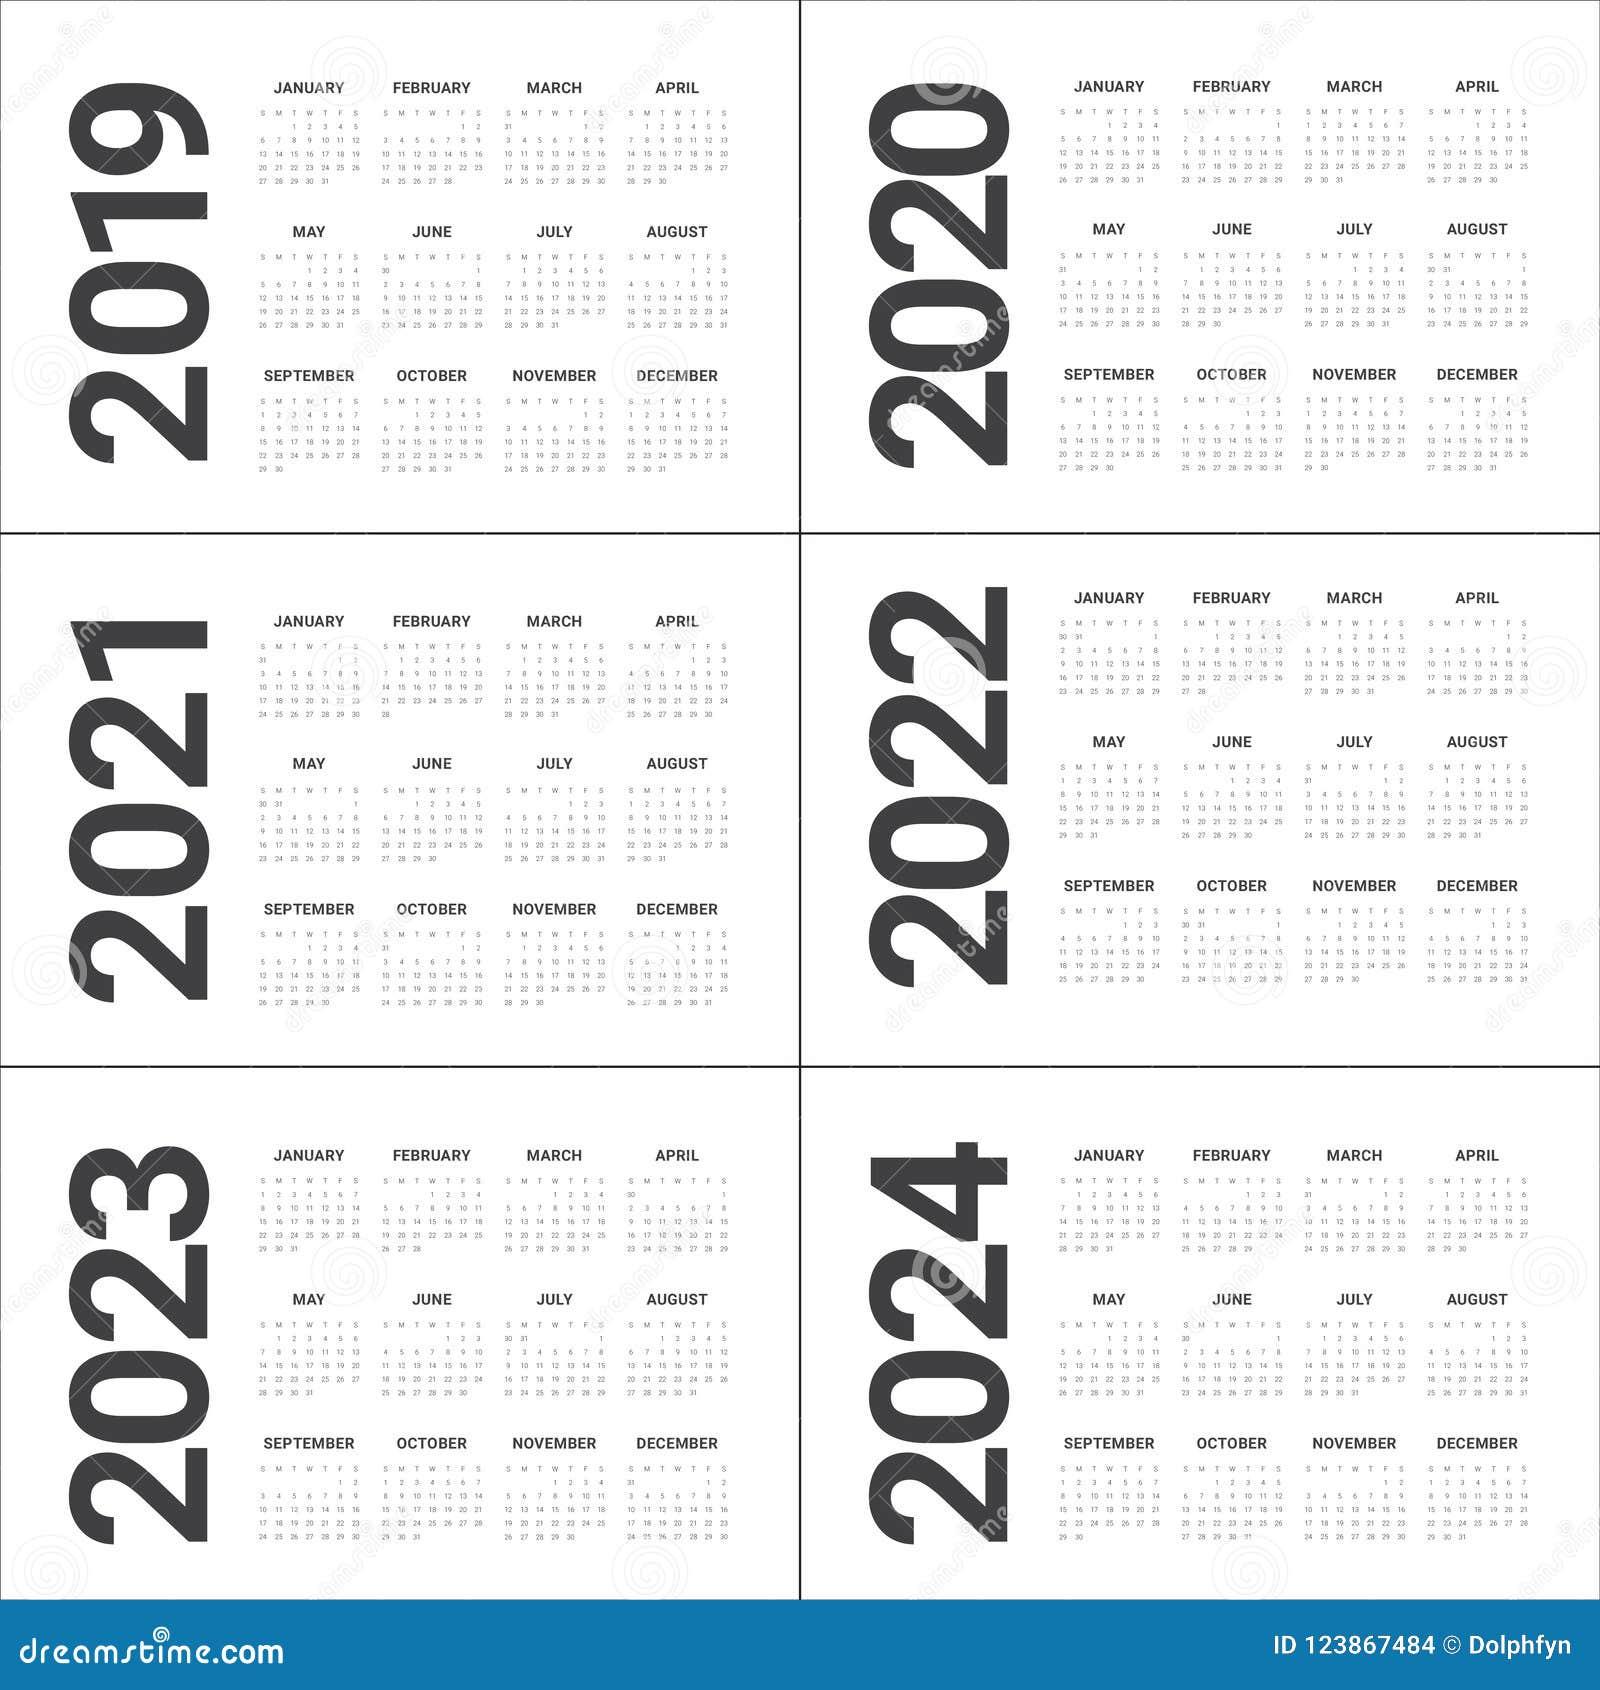 Printable Calendar 2022 2023.Year 2019 2020 2021 2022 2023 2024 Calendar Vector Design Template Stock Vector Illustration Of 2024 Monthly 123867484